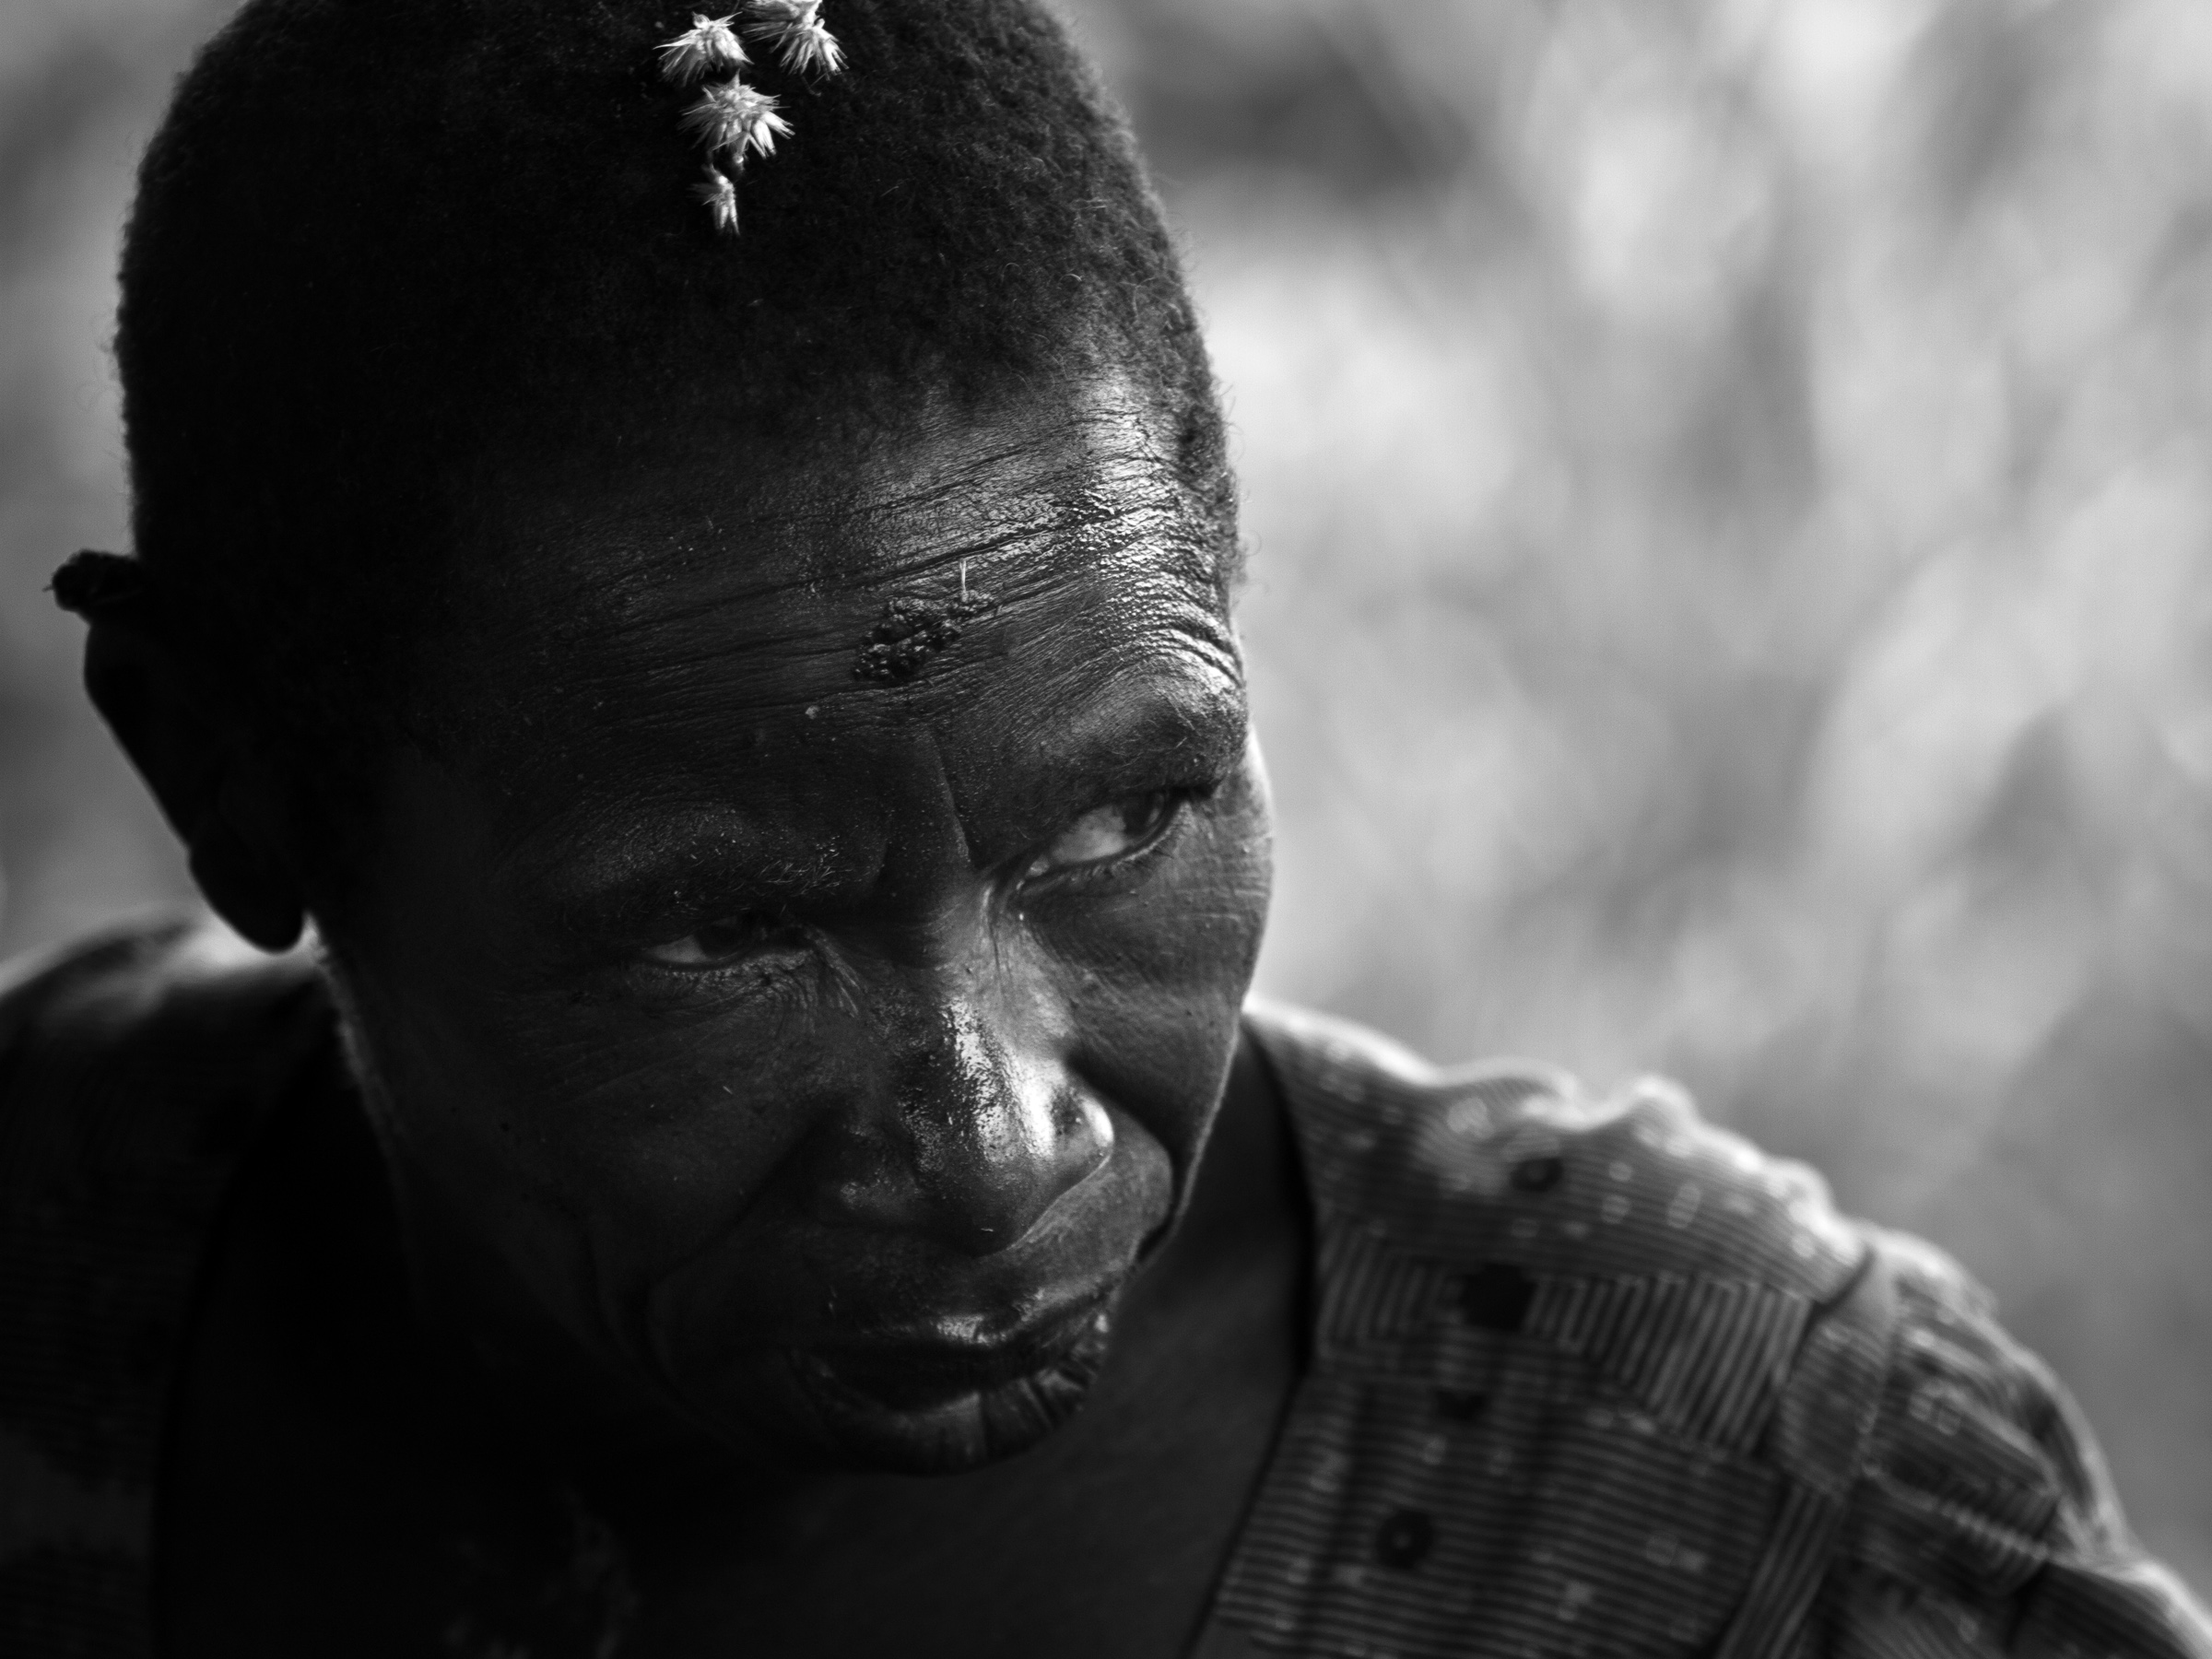 Emiliano Tidona_Series Nord Kivu Portraits_Untitled 1.jpg